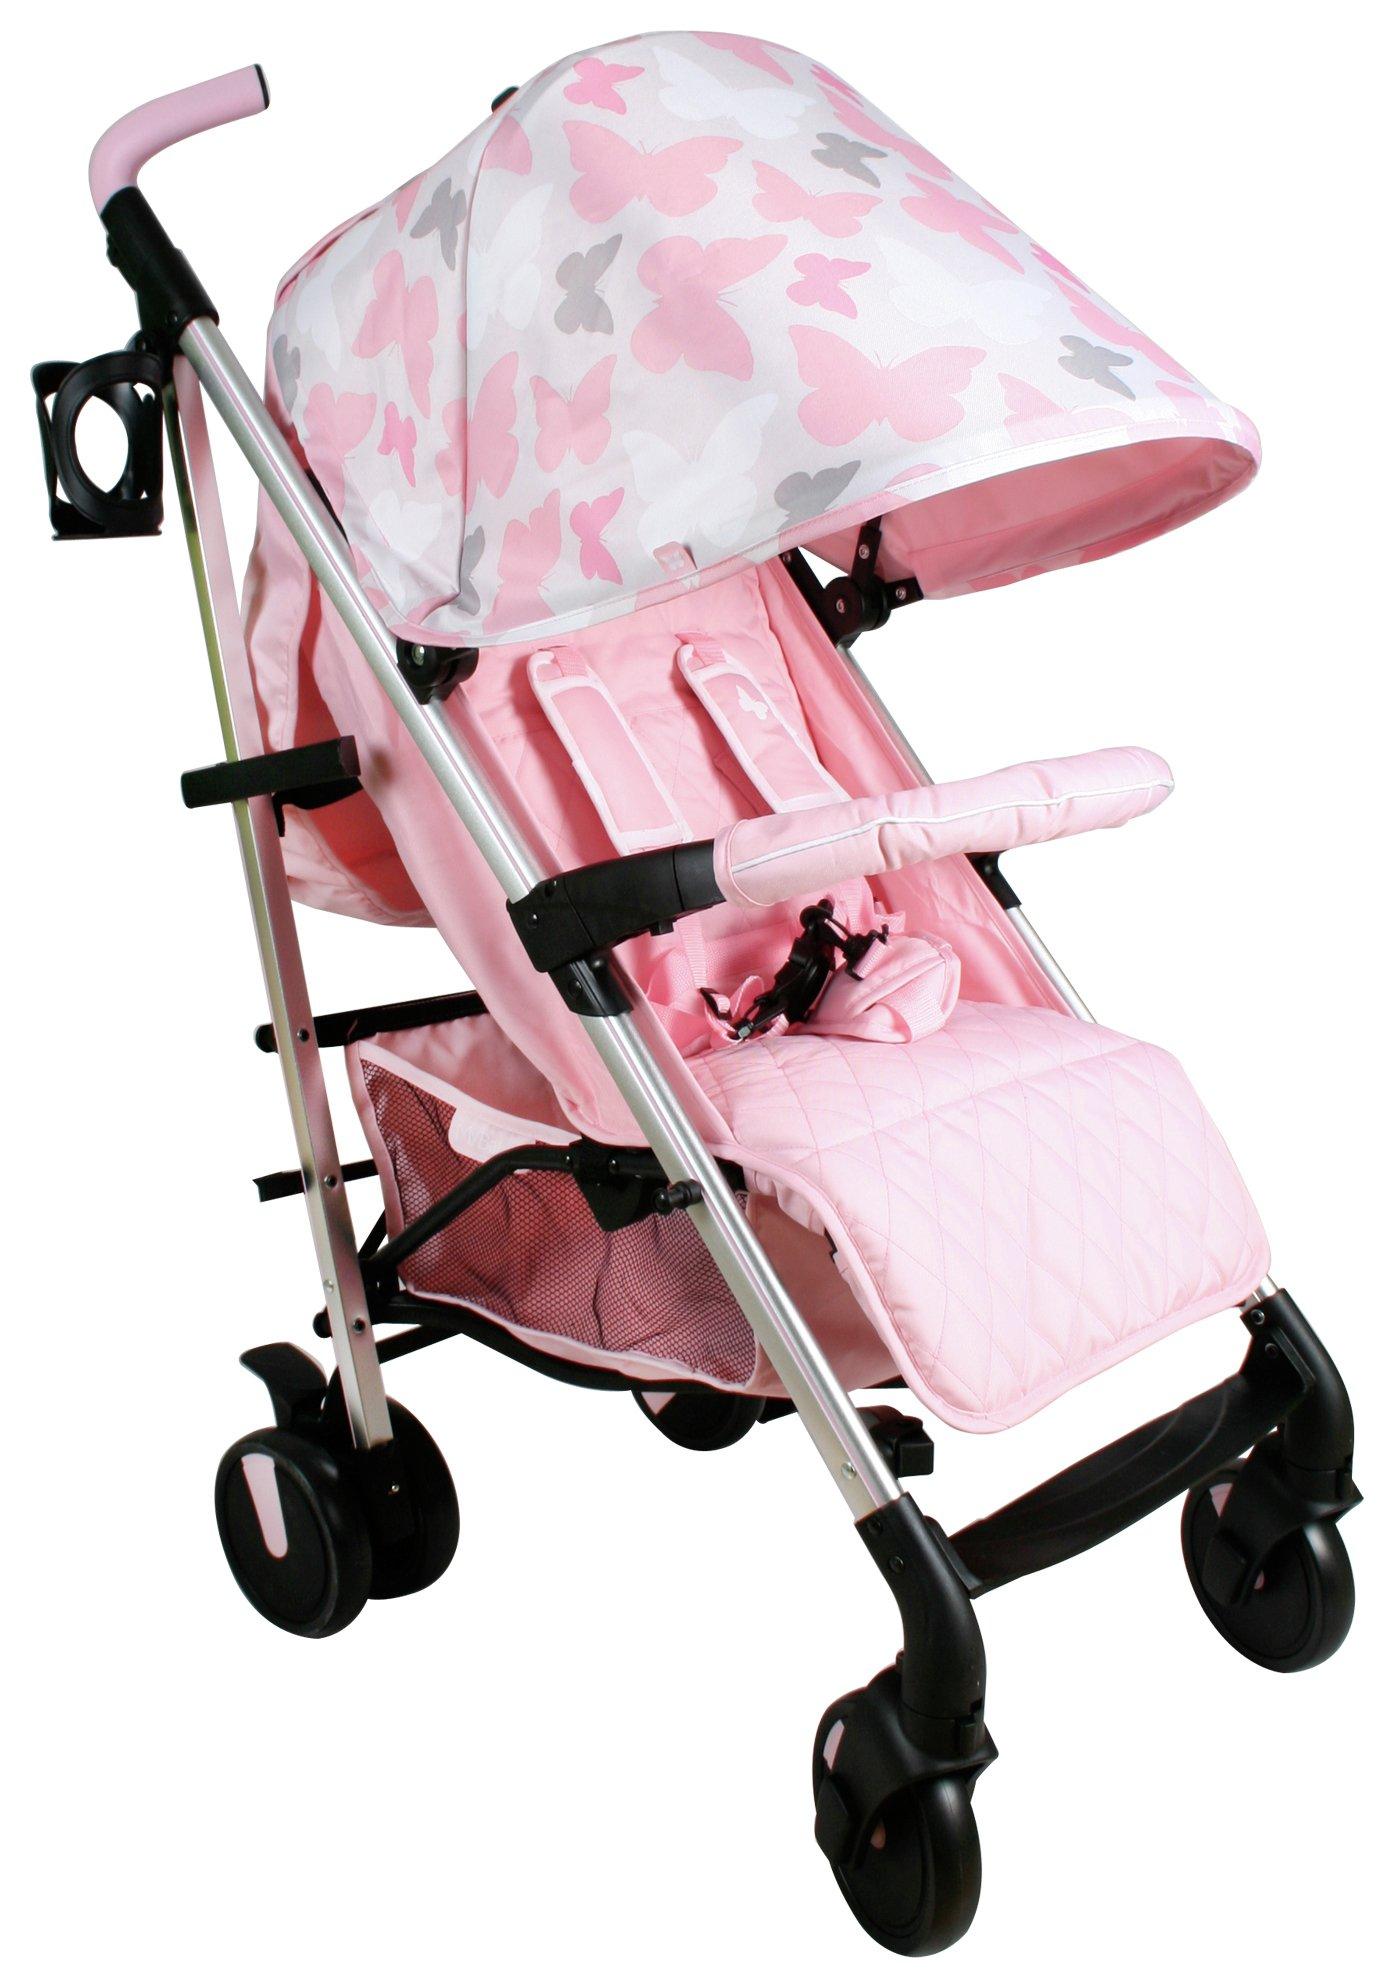 My Babiie MB51 Katie Piper Pink Butterflies Stroller